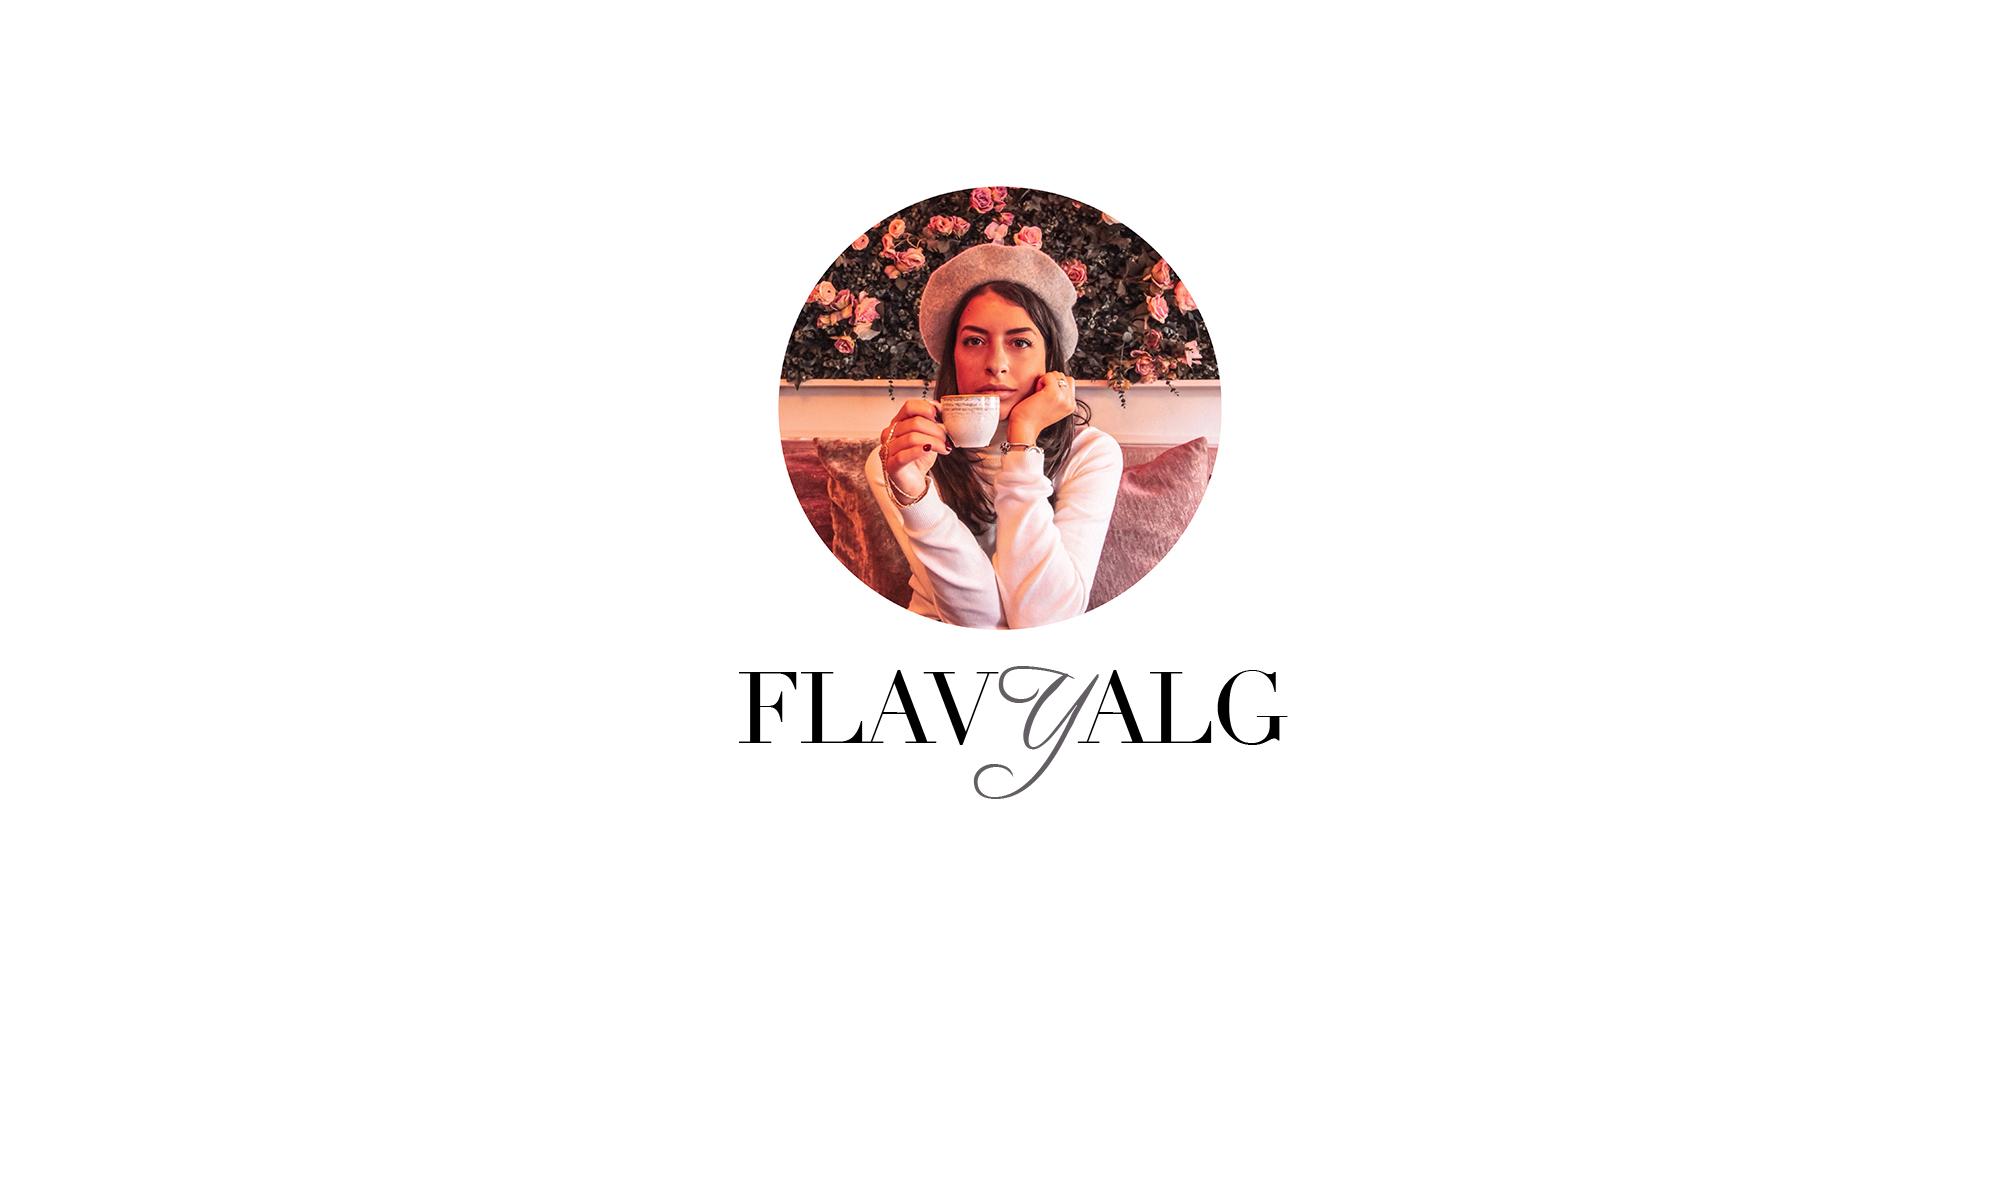 Flavyalg